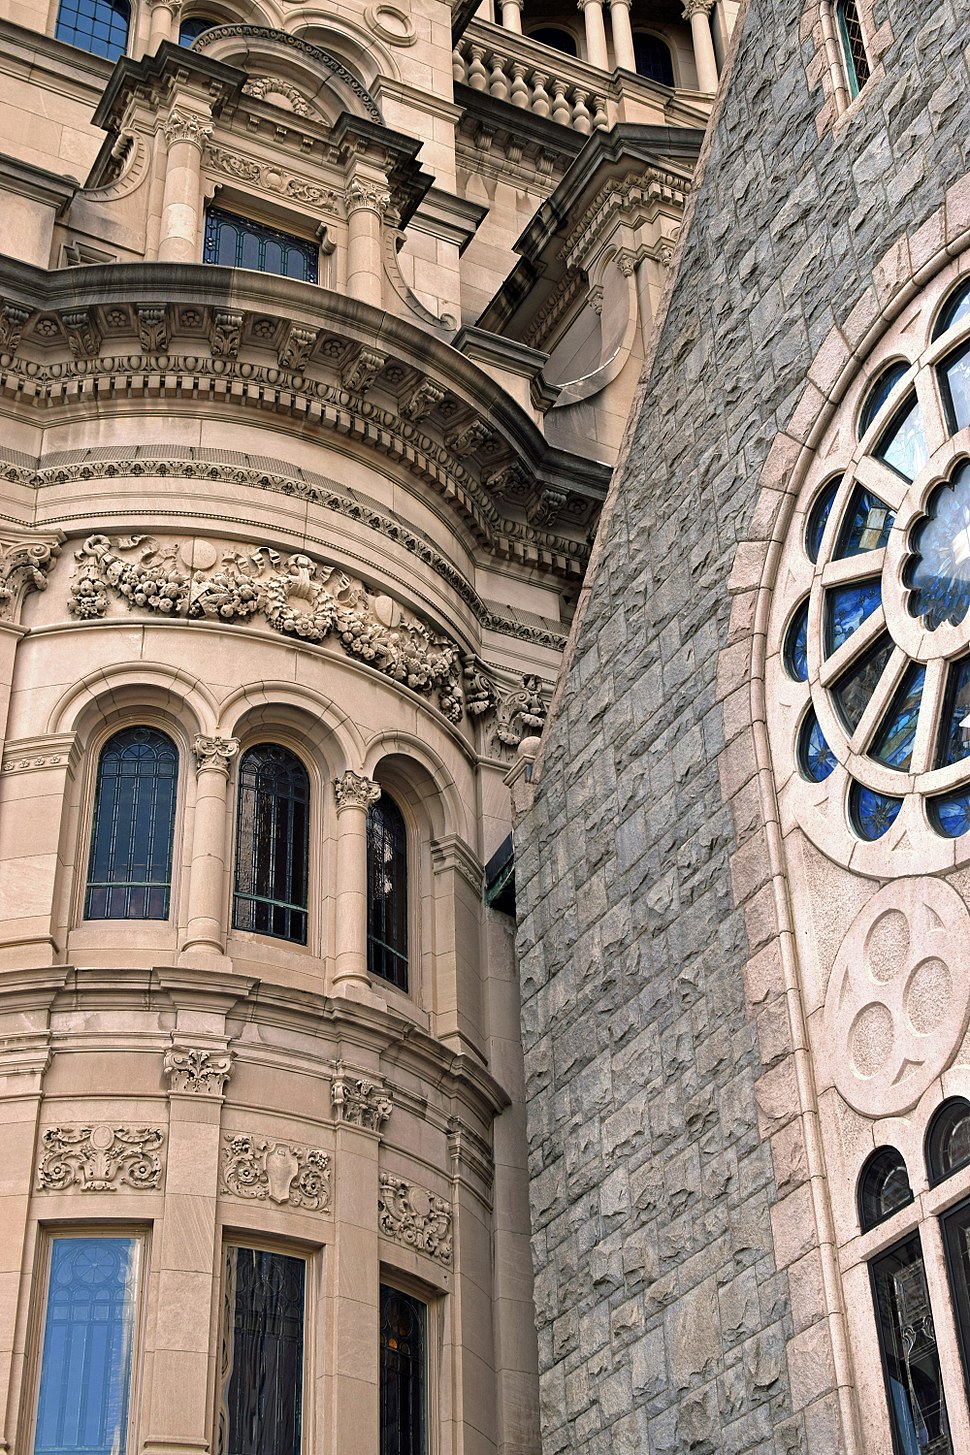 First Church of Christ Scientist in Boston (closeup)